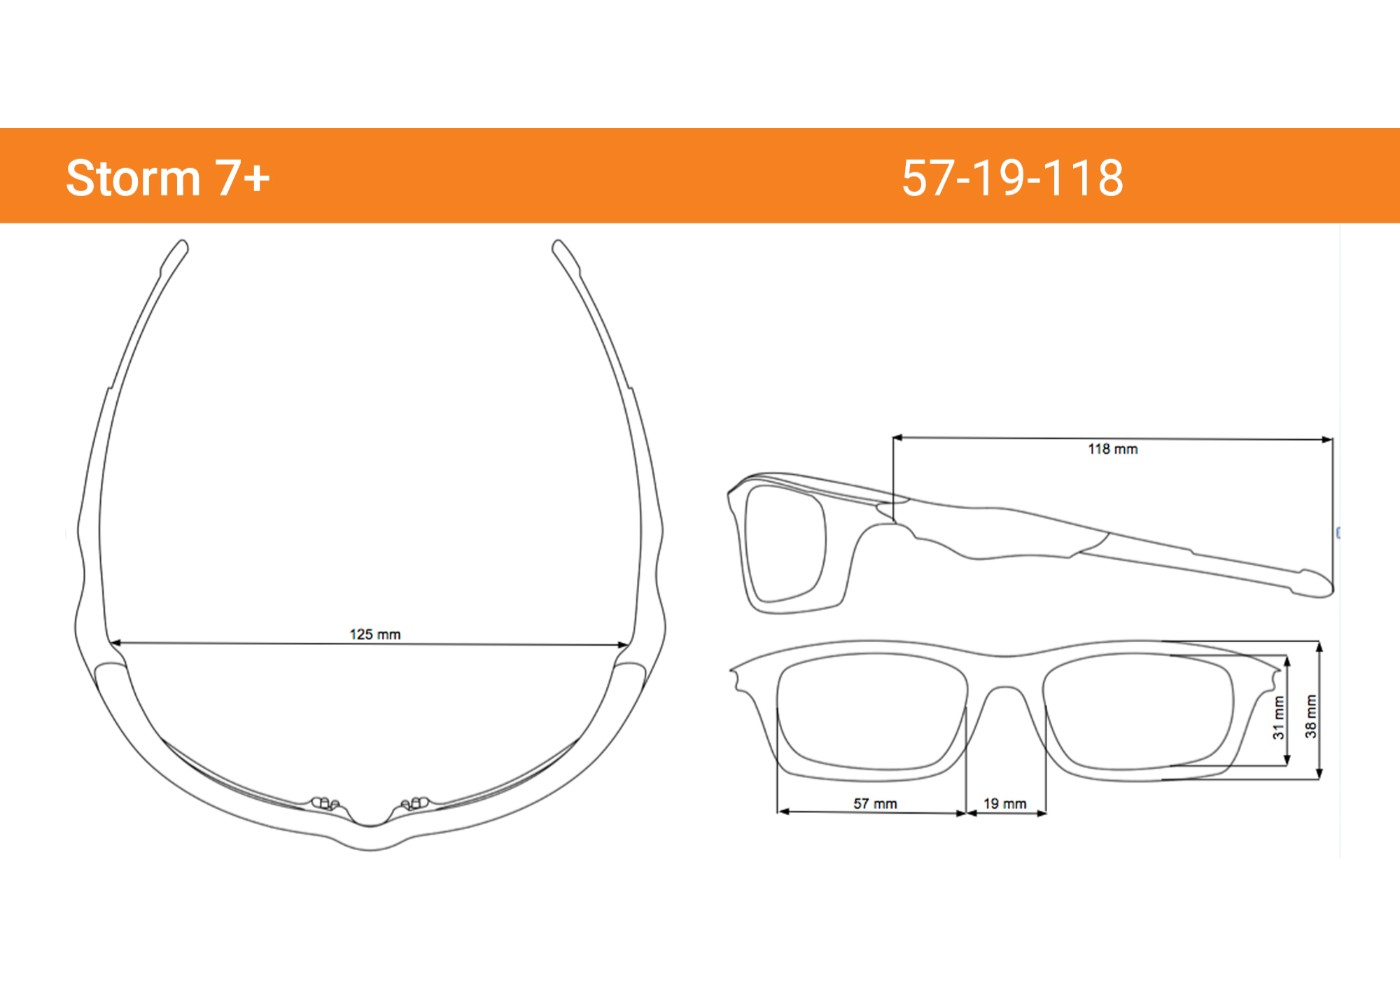 e1c86b02f5 Storm Polarized Sunglasses for Youth